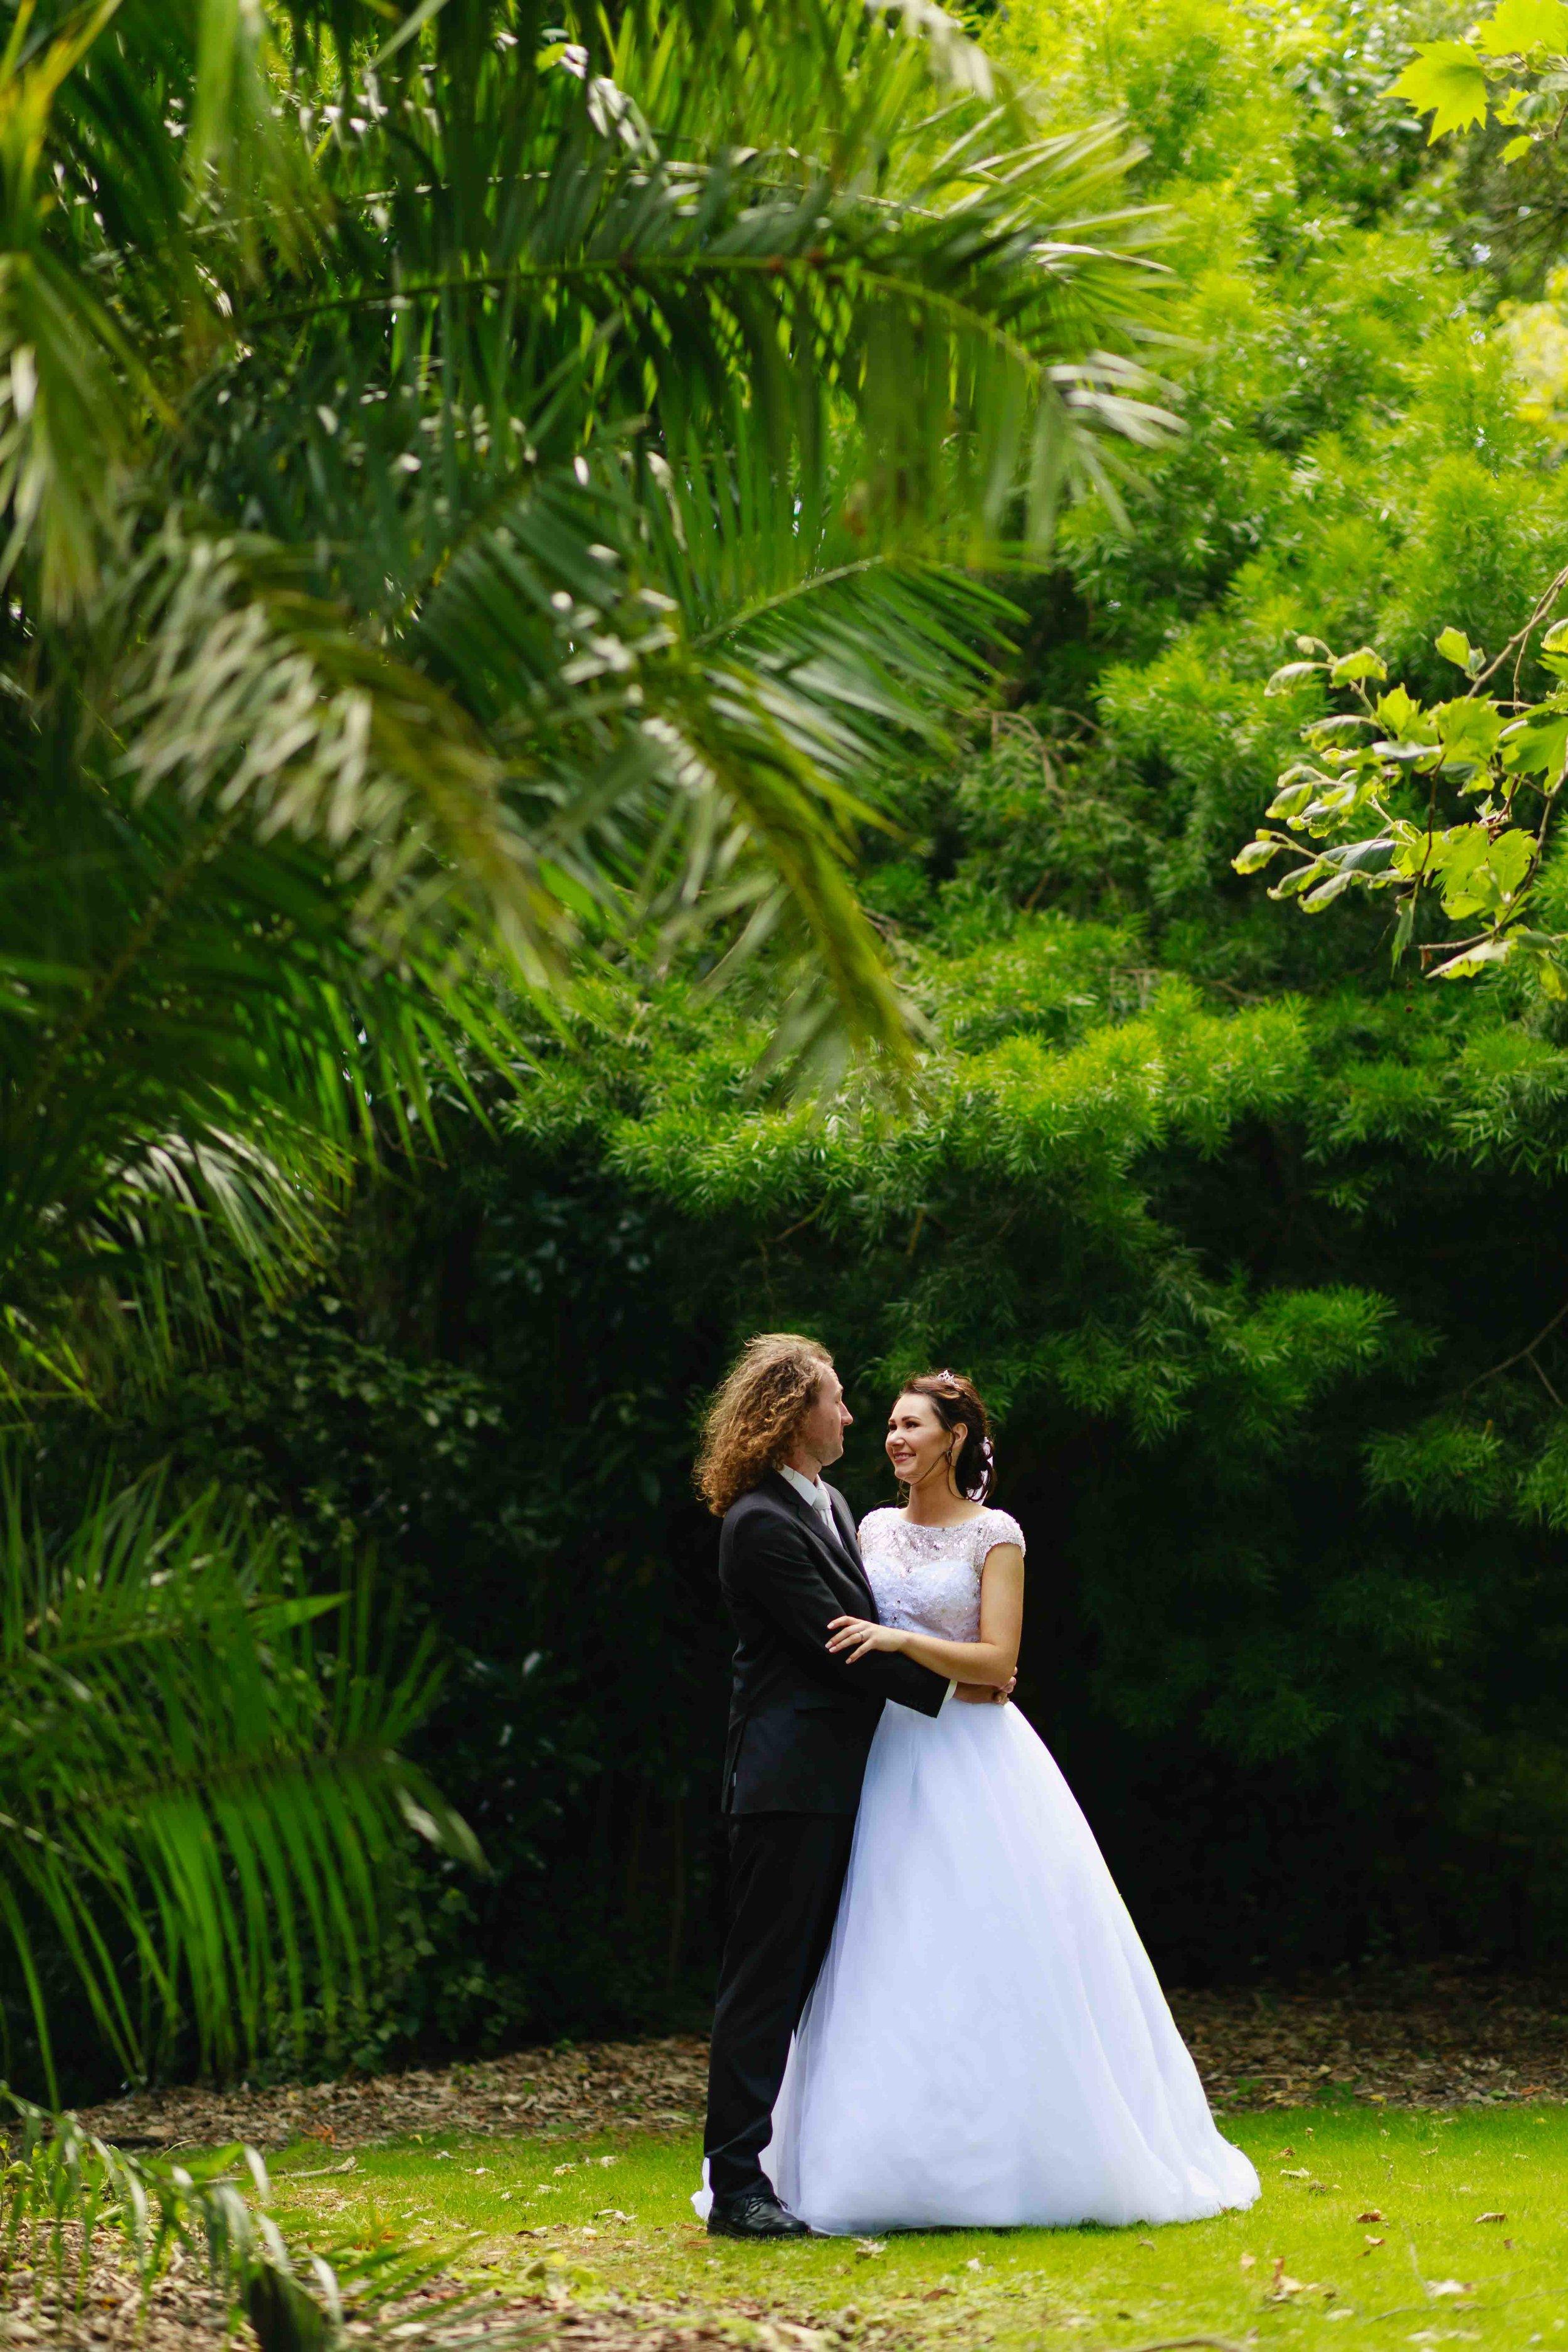 the-chalet-highlight-wedding-photography-palmerston-north-148.jpg